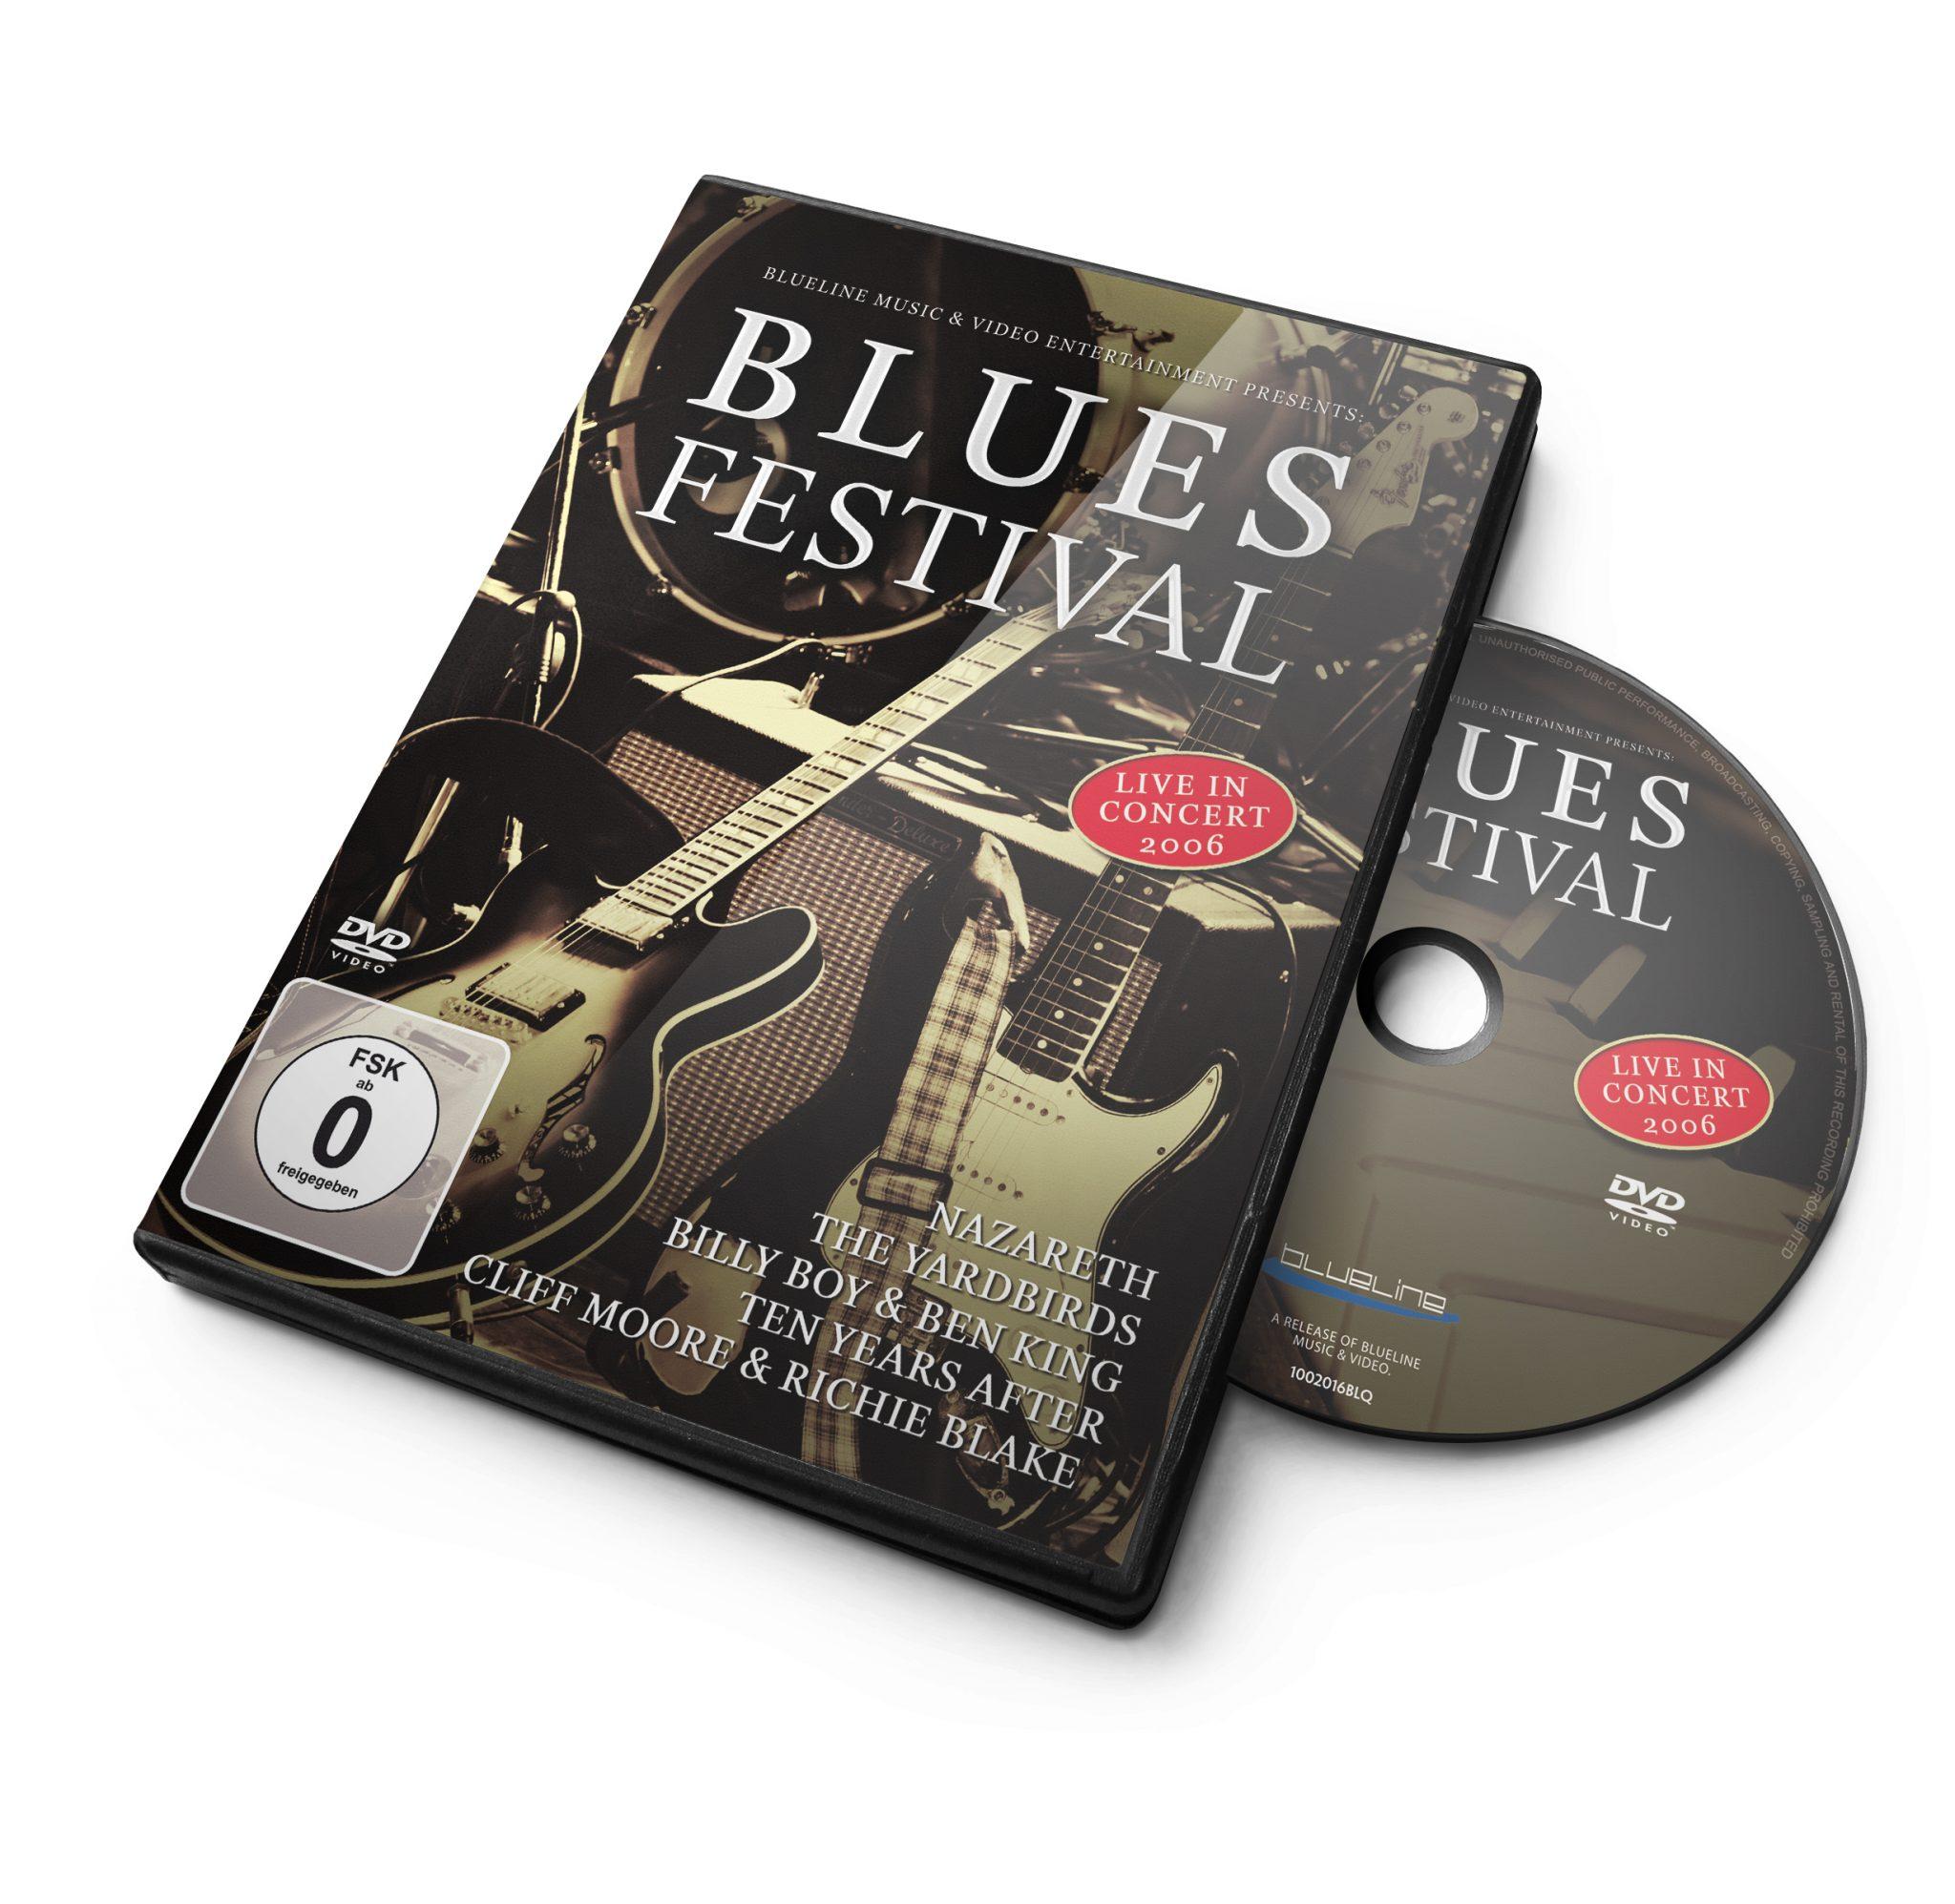 blues festival_dvd